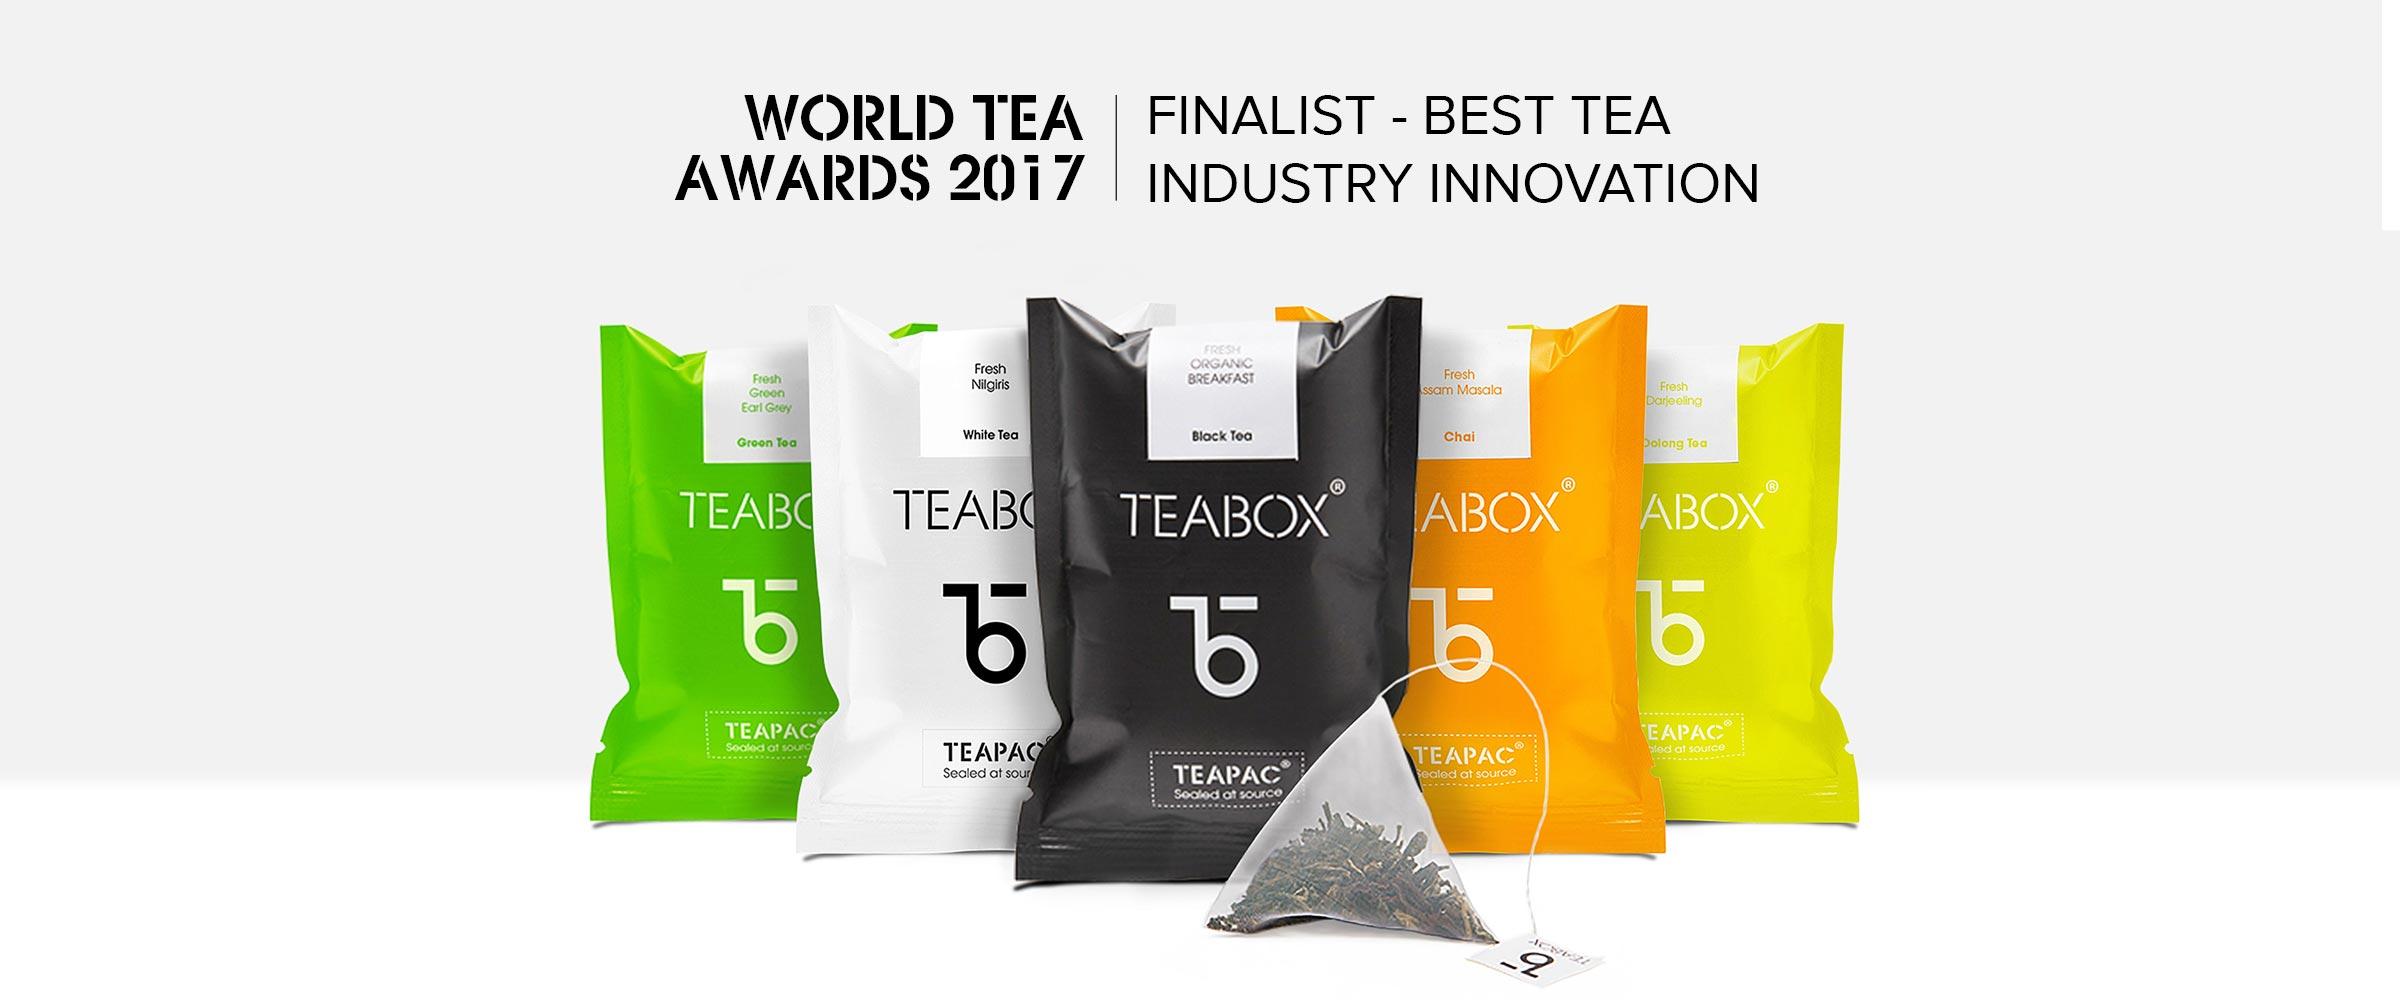 Teabox_Best_Innovator_2017